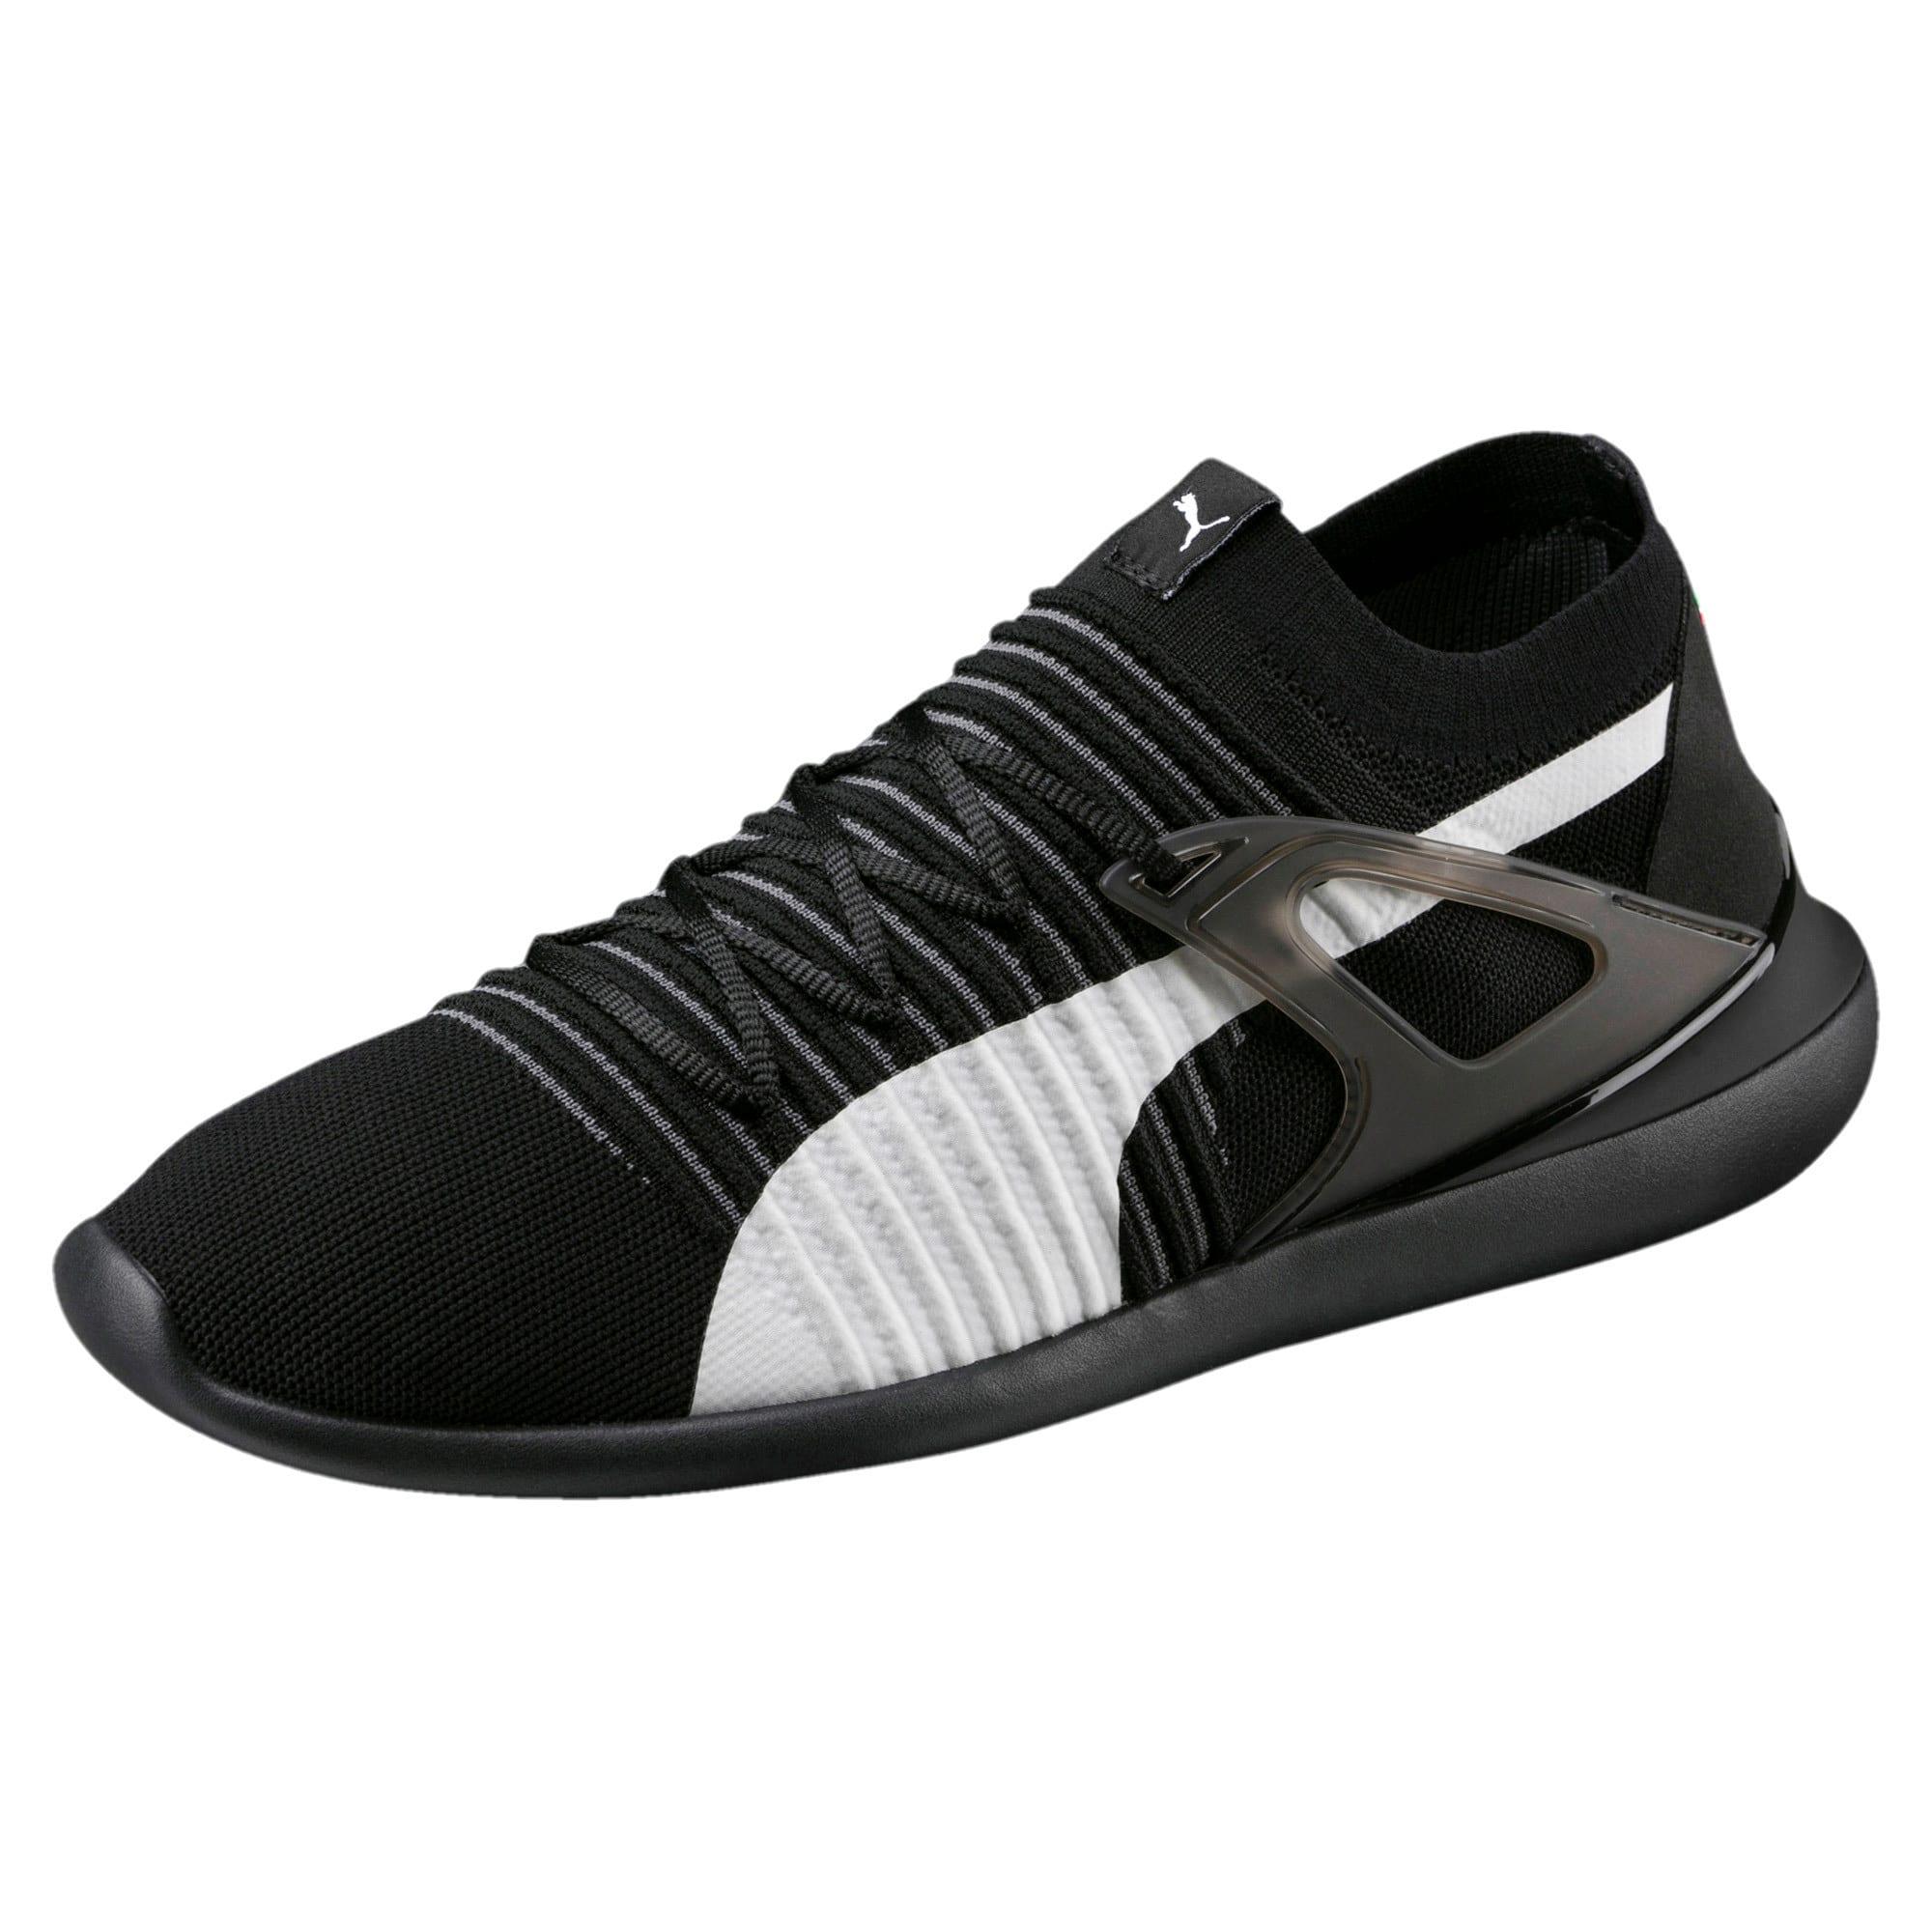 Thumbnail 1 of Ferrari Evo Cat Sock Lace Trainers, Puma Black-Puma White-Black, medium-IND